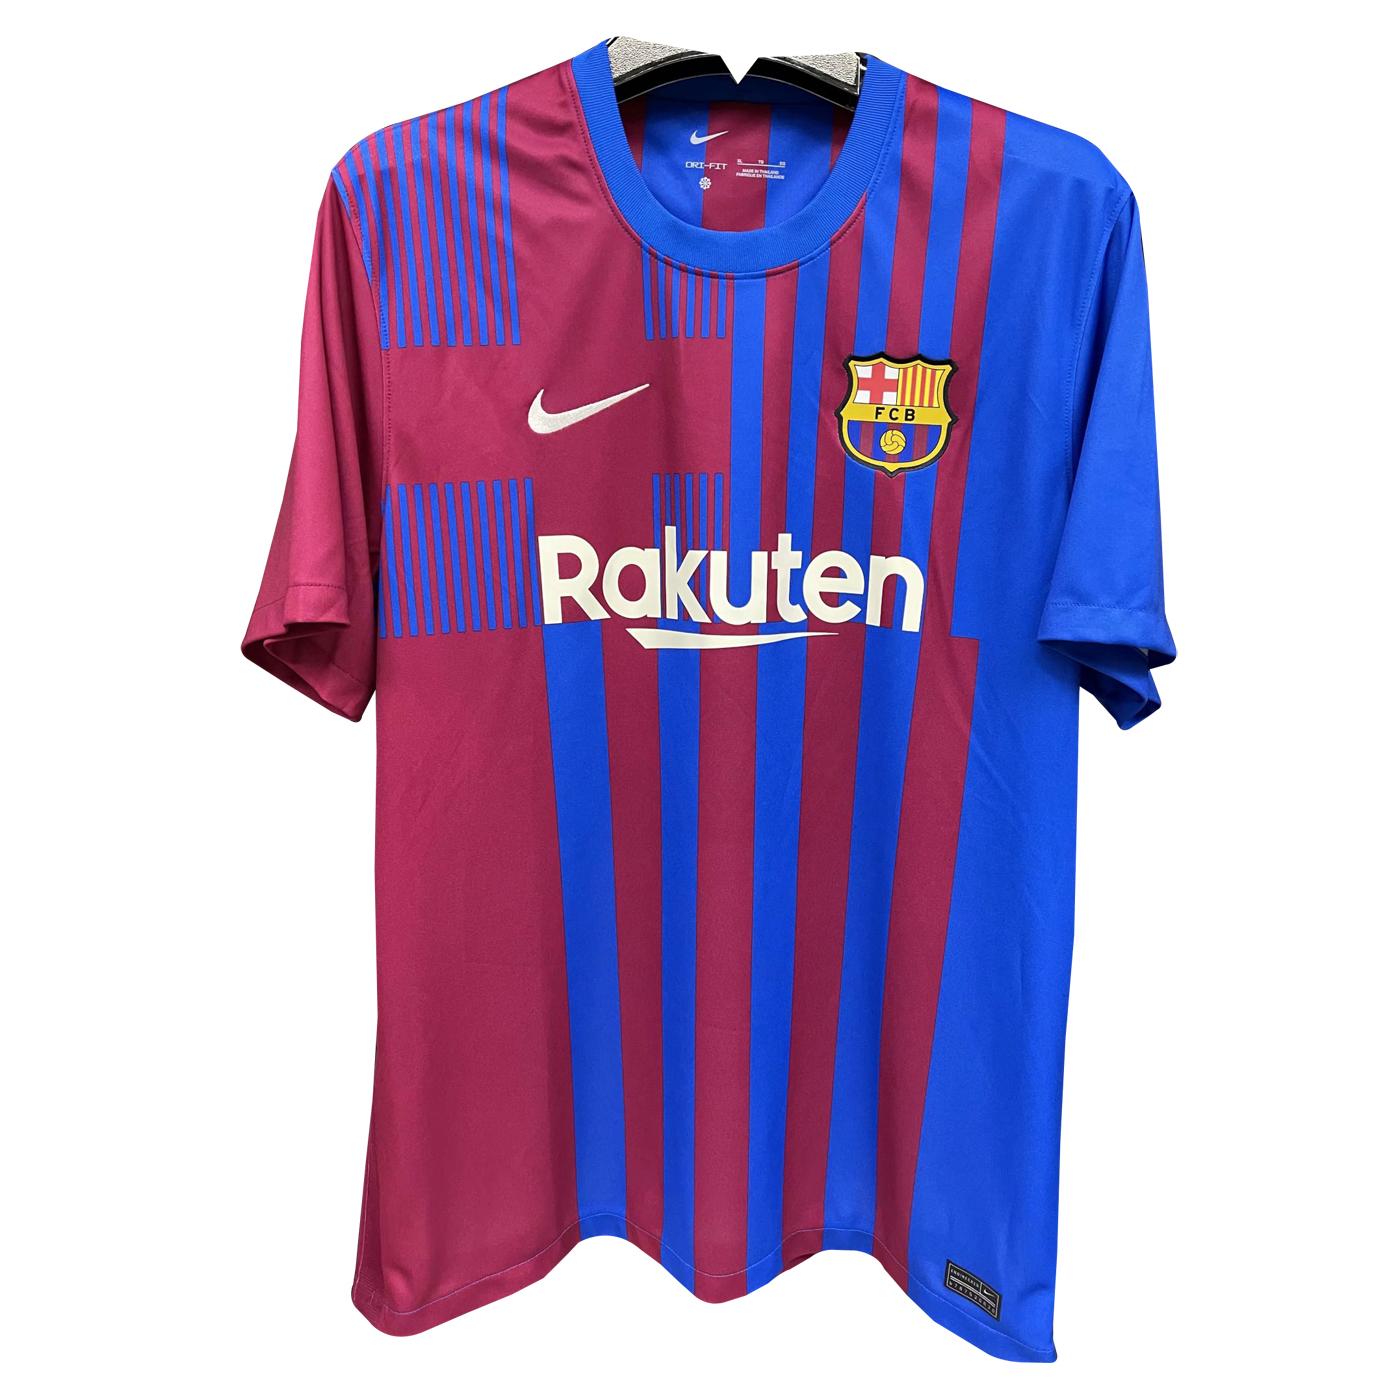 GoGoalShop, Cheap Soccer Jerseys, Kids Soccer Jerseys, Retro ...